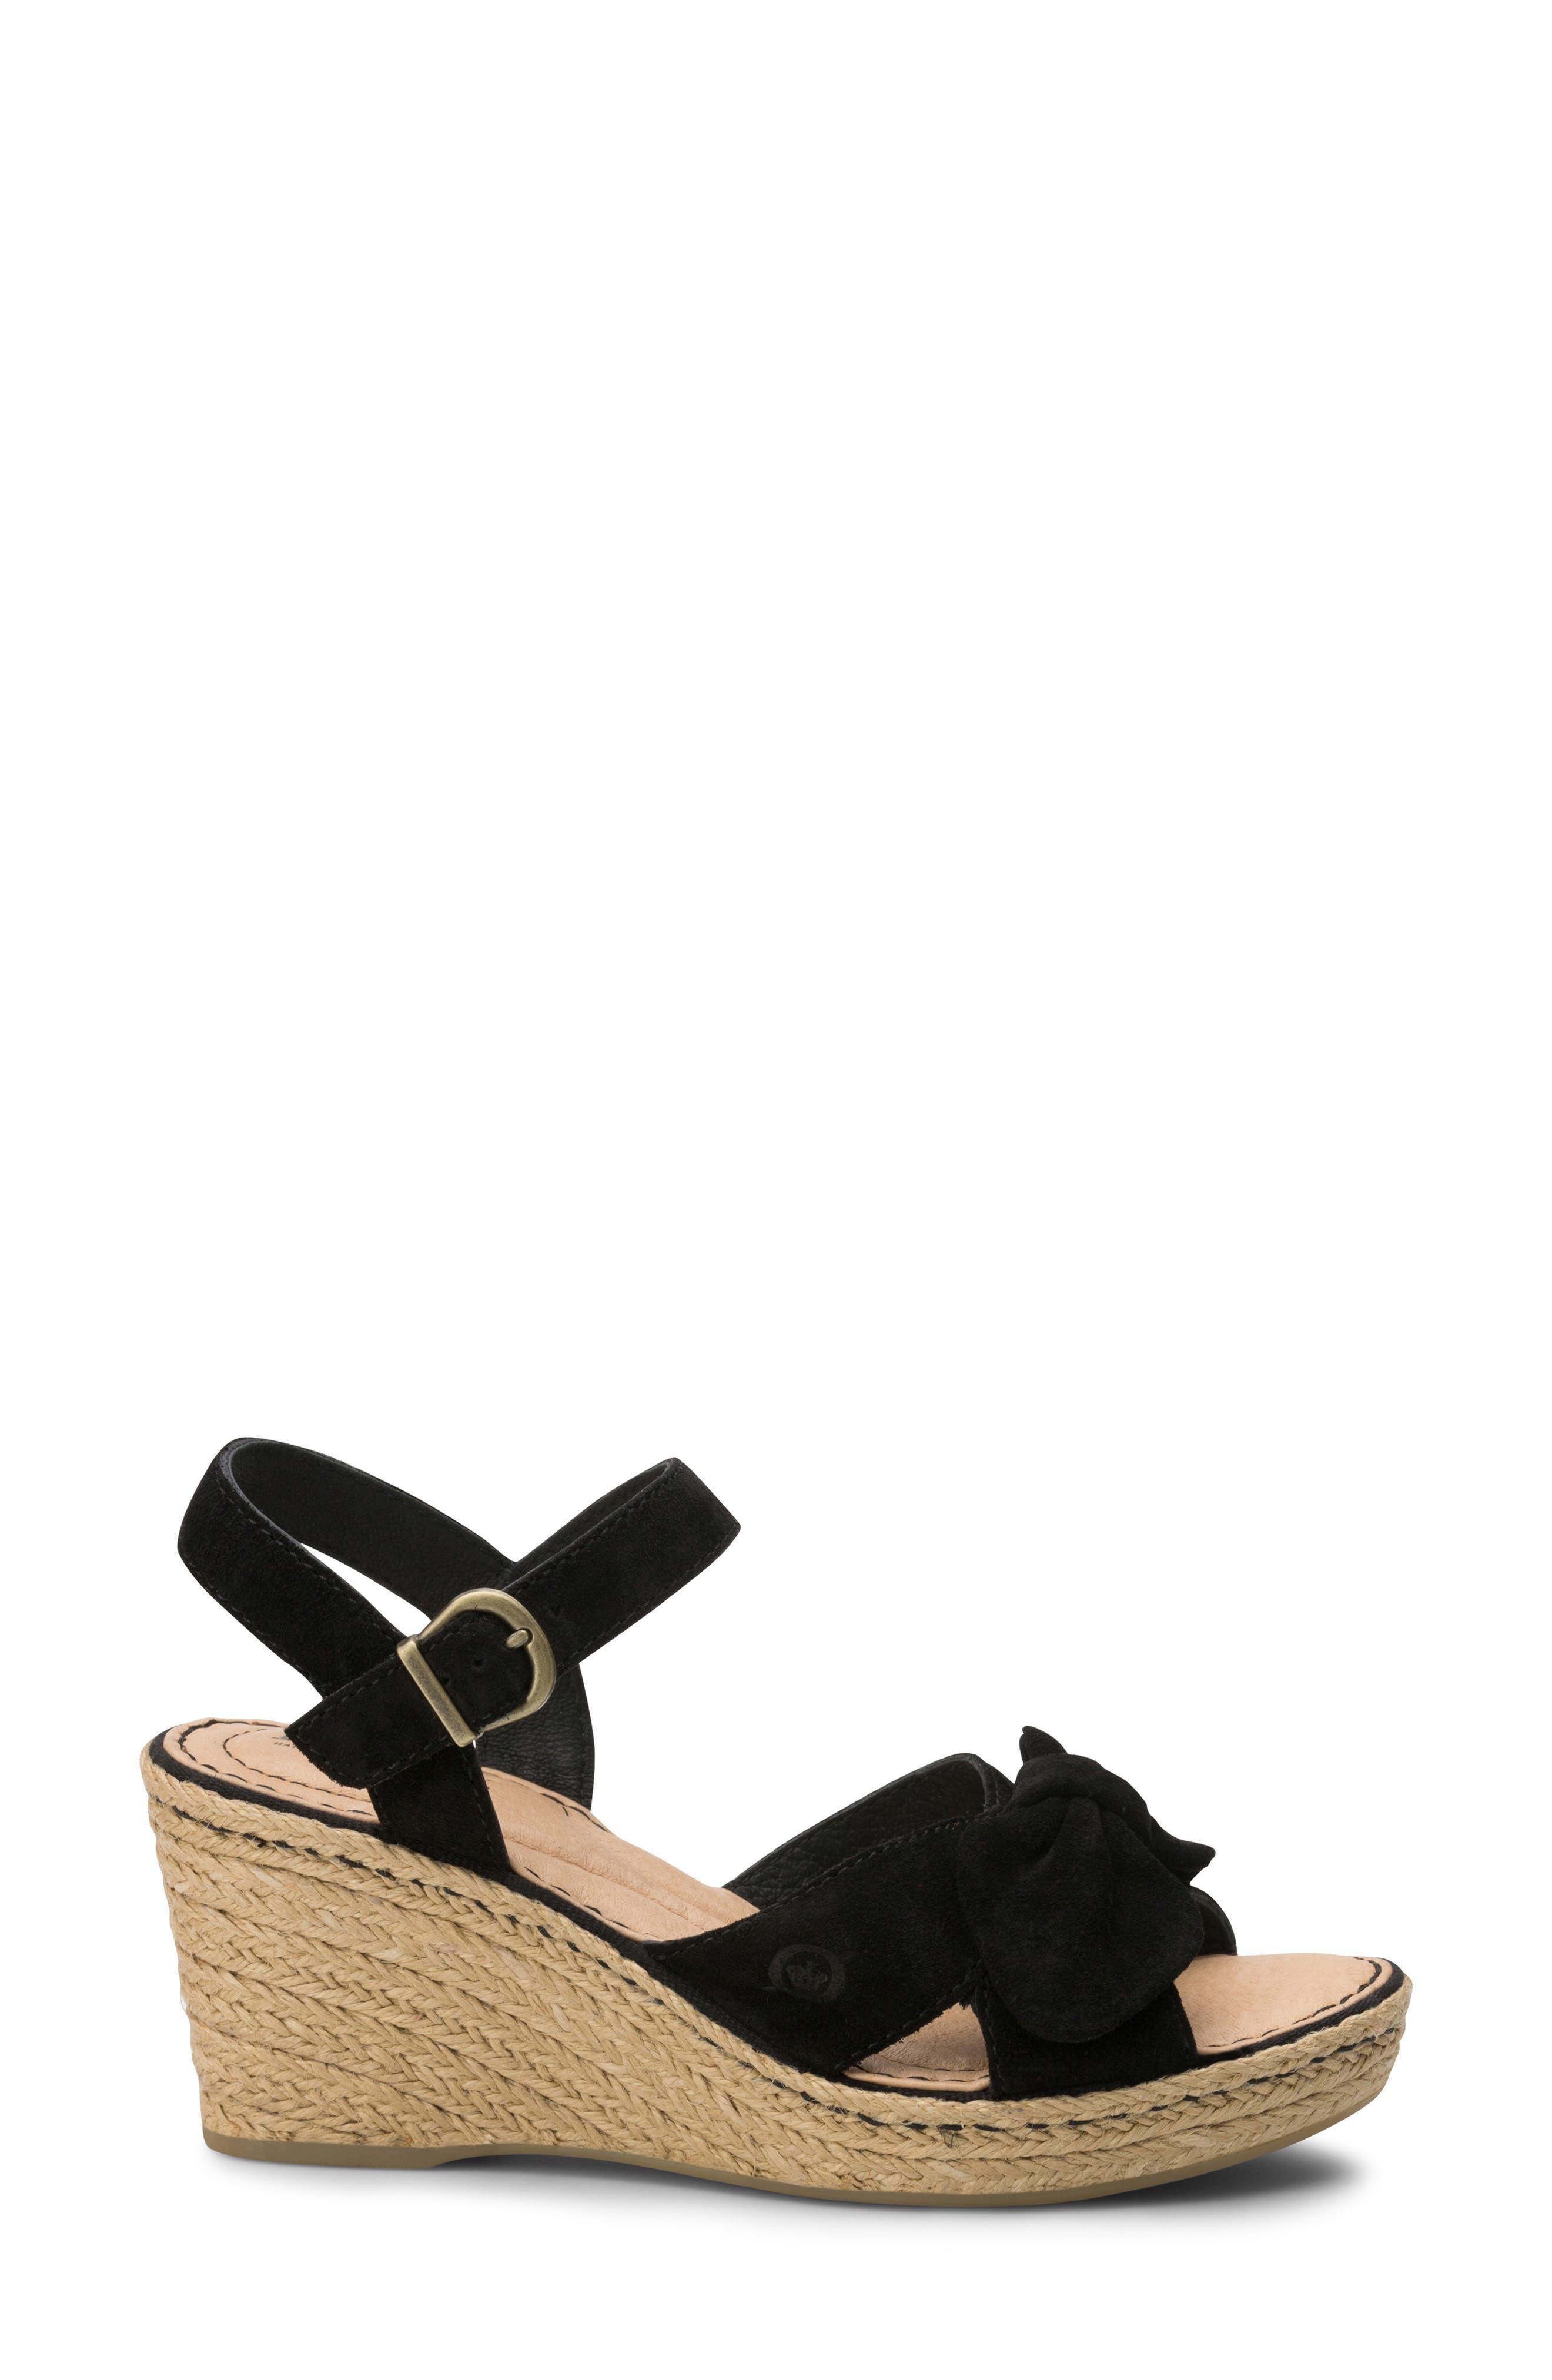 BØRN, Monticello Knotted Wedge Sandal, Alternate thumbnail 3, color, BLACK SUEDE